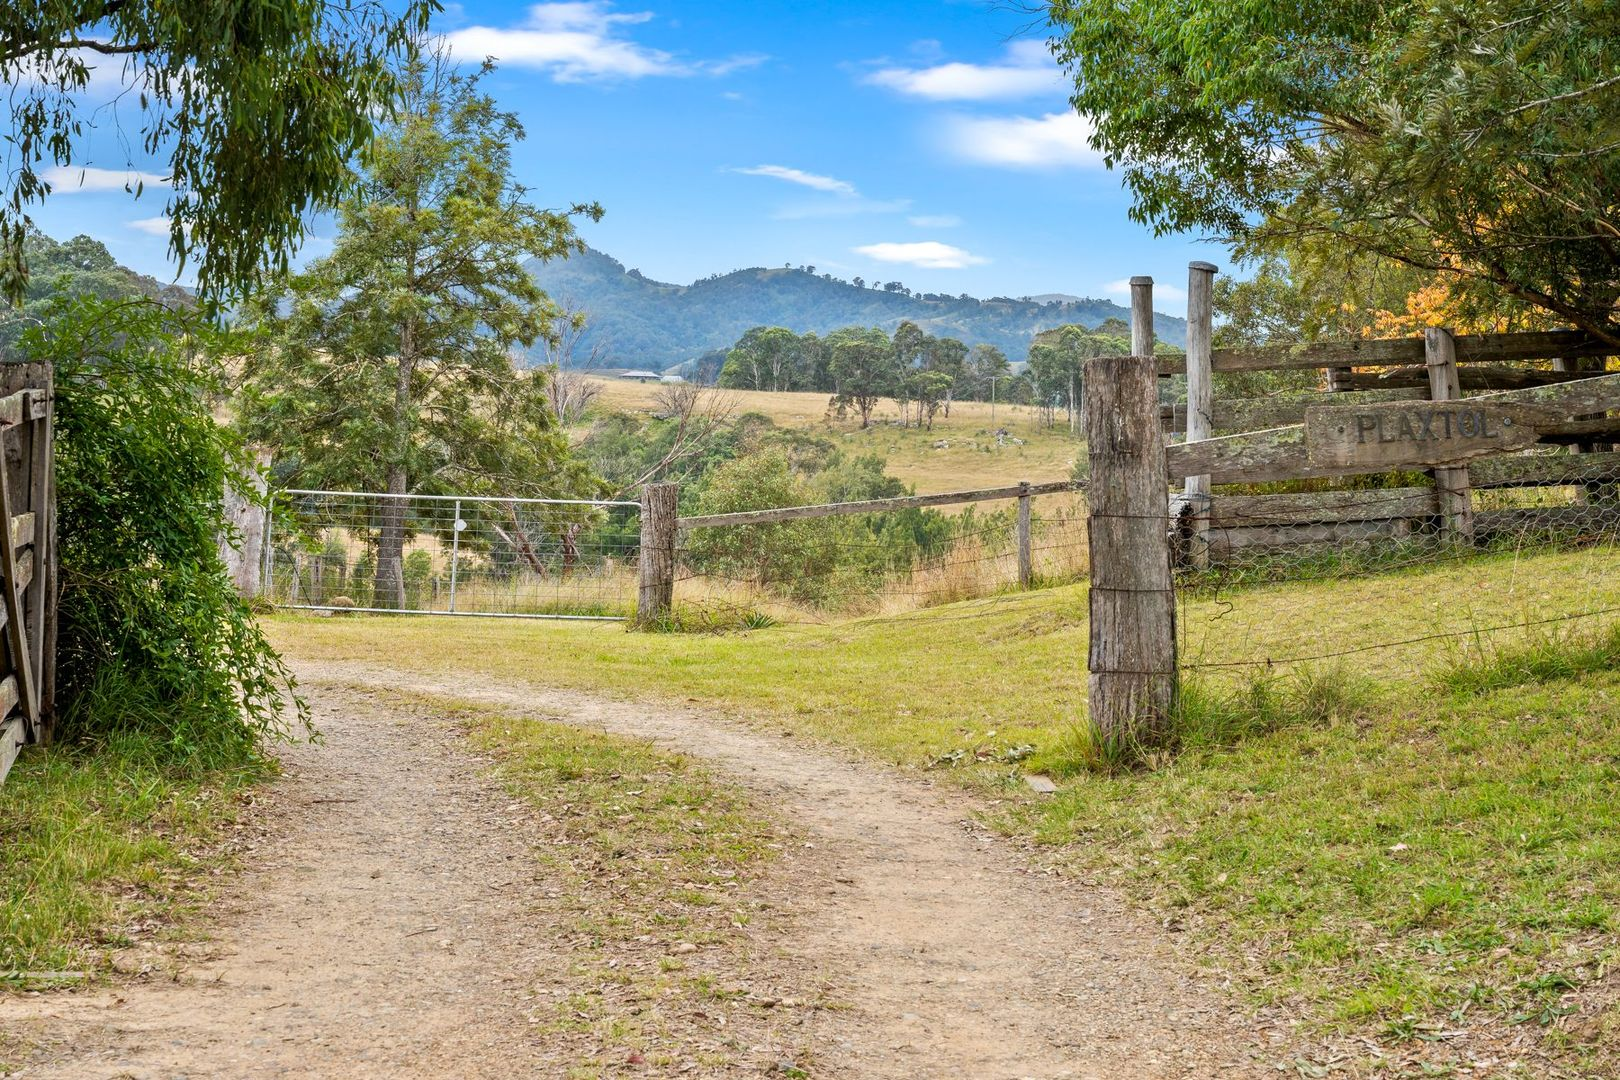 159 GOORANGOOLA CREEK ROAD, Goorangoola NSW 2330, Image 1